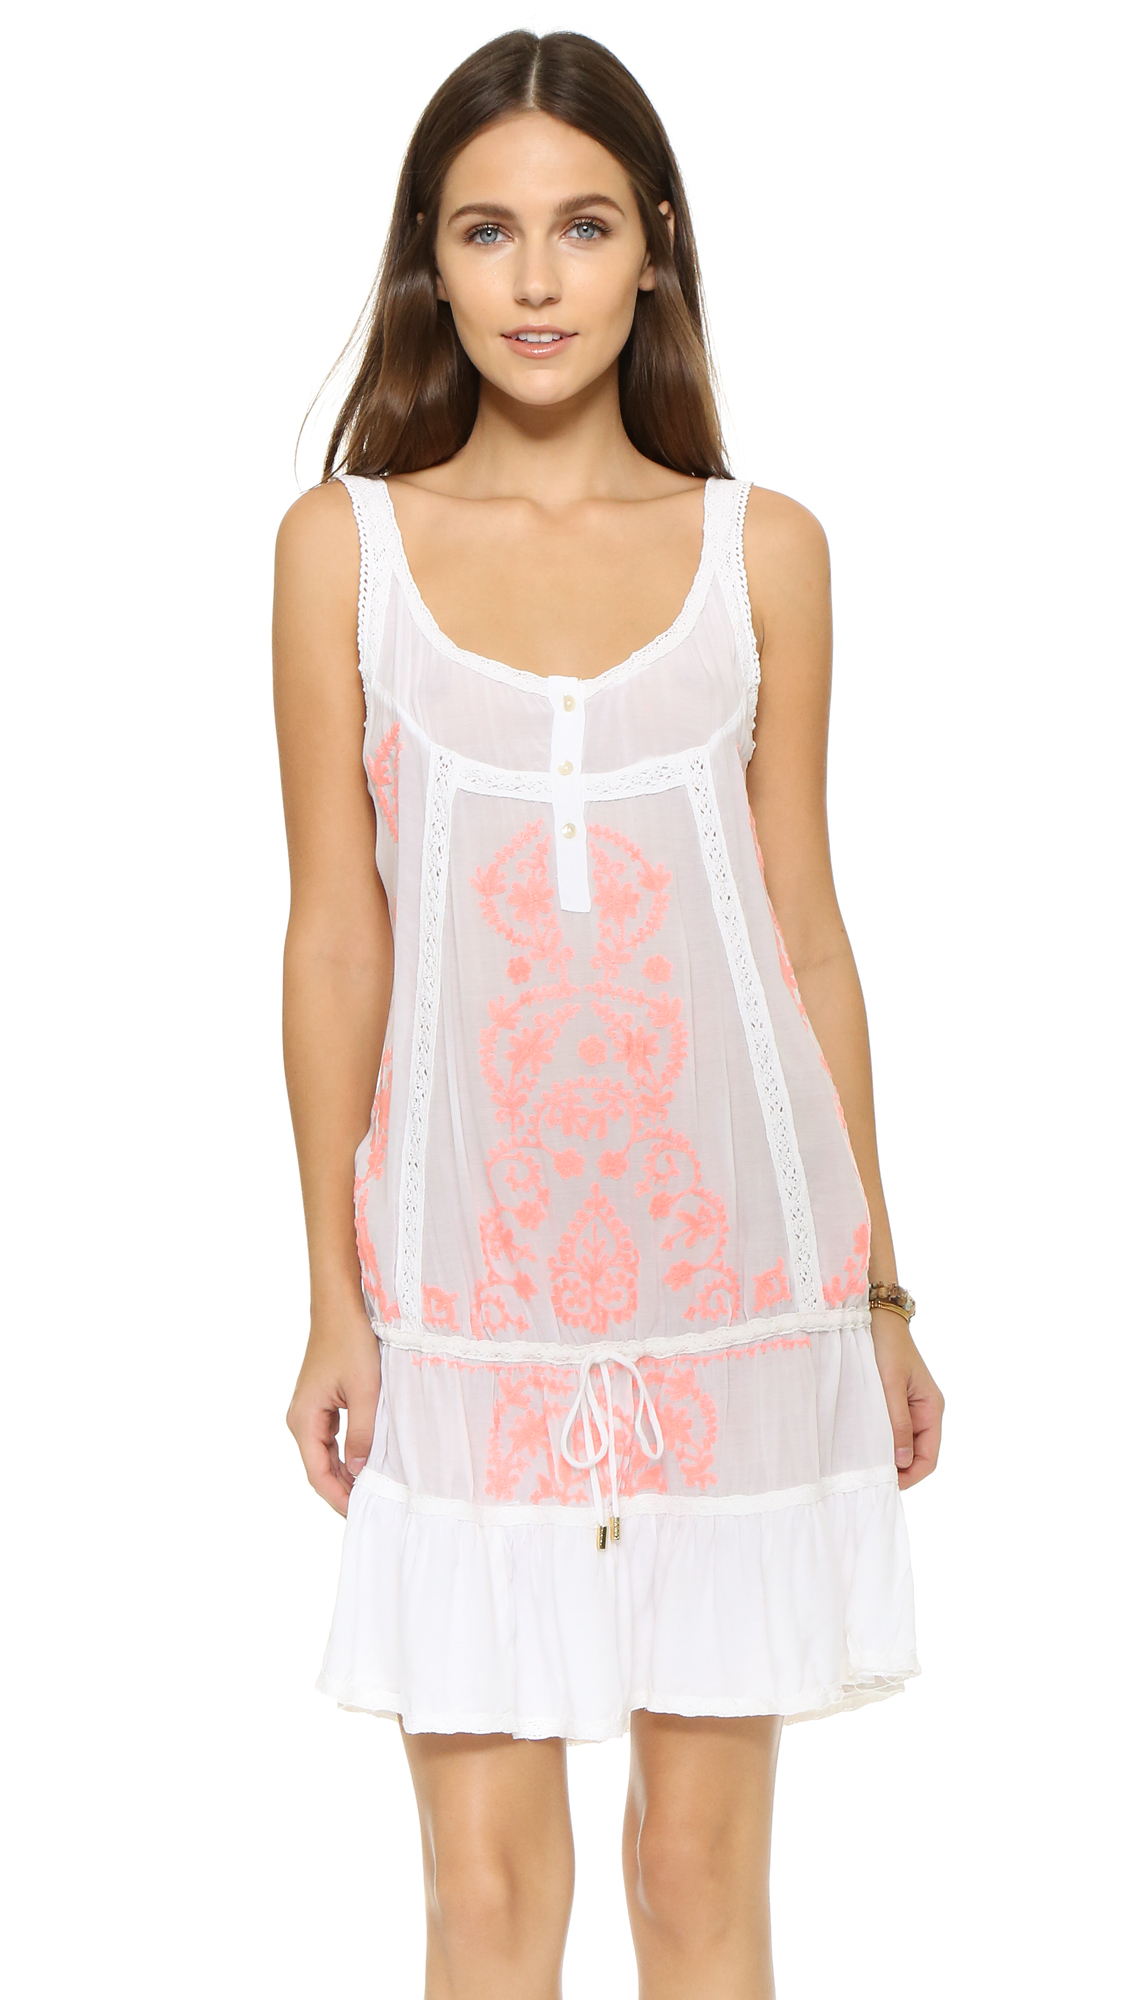 f9bf0a4a0153 Lyst - Melissa Odabash Jaz Beach Dress in White